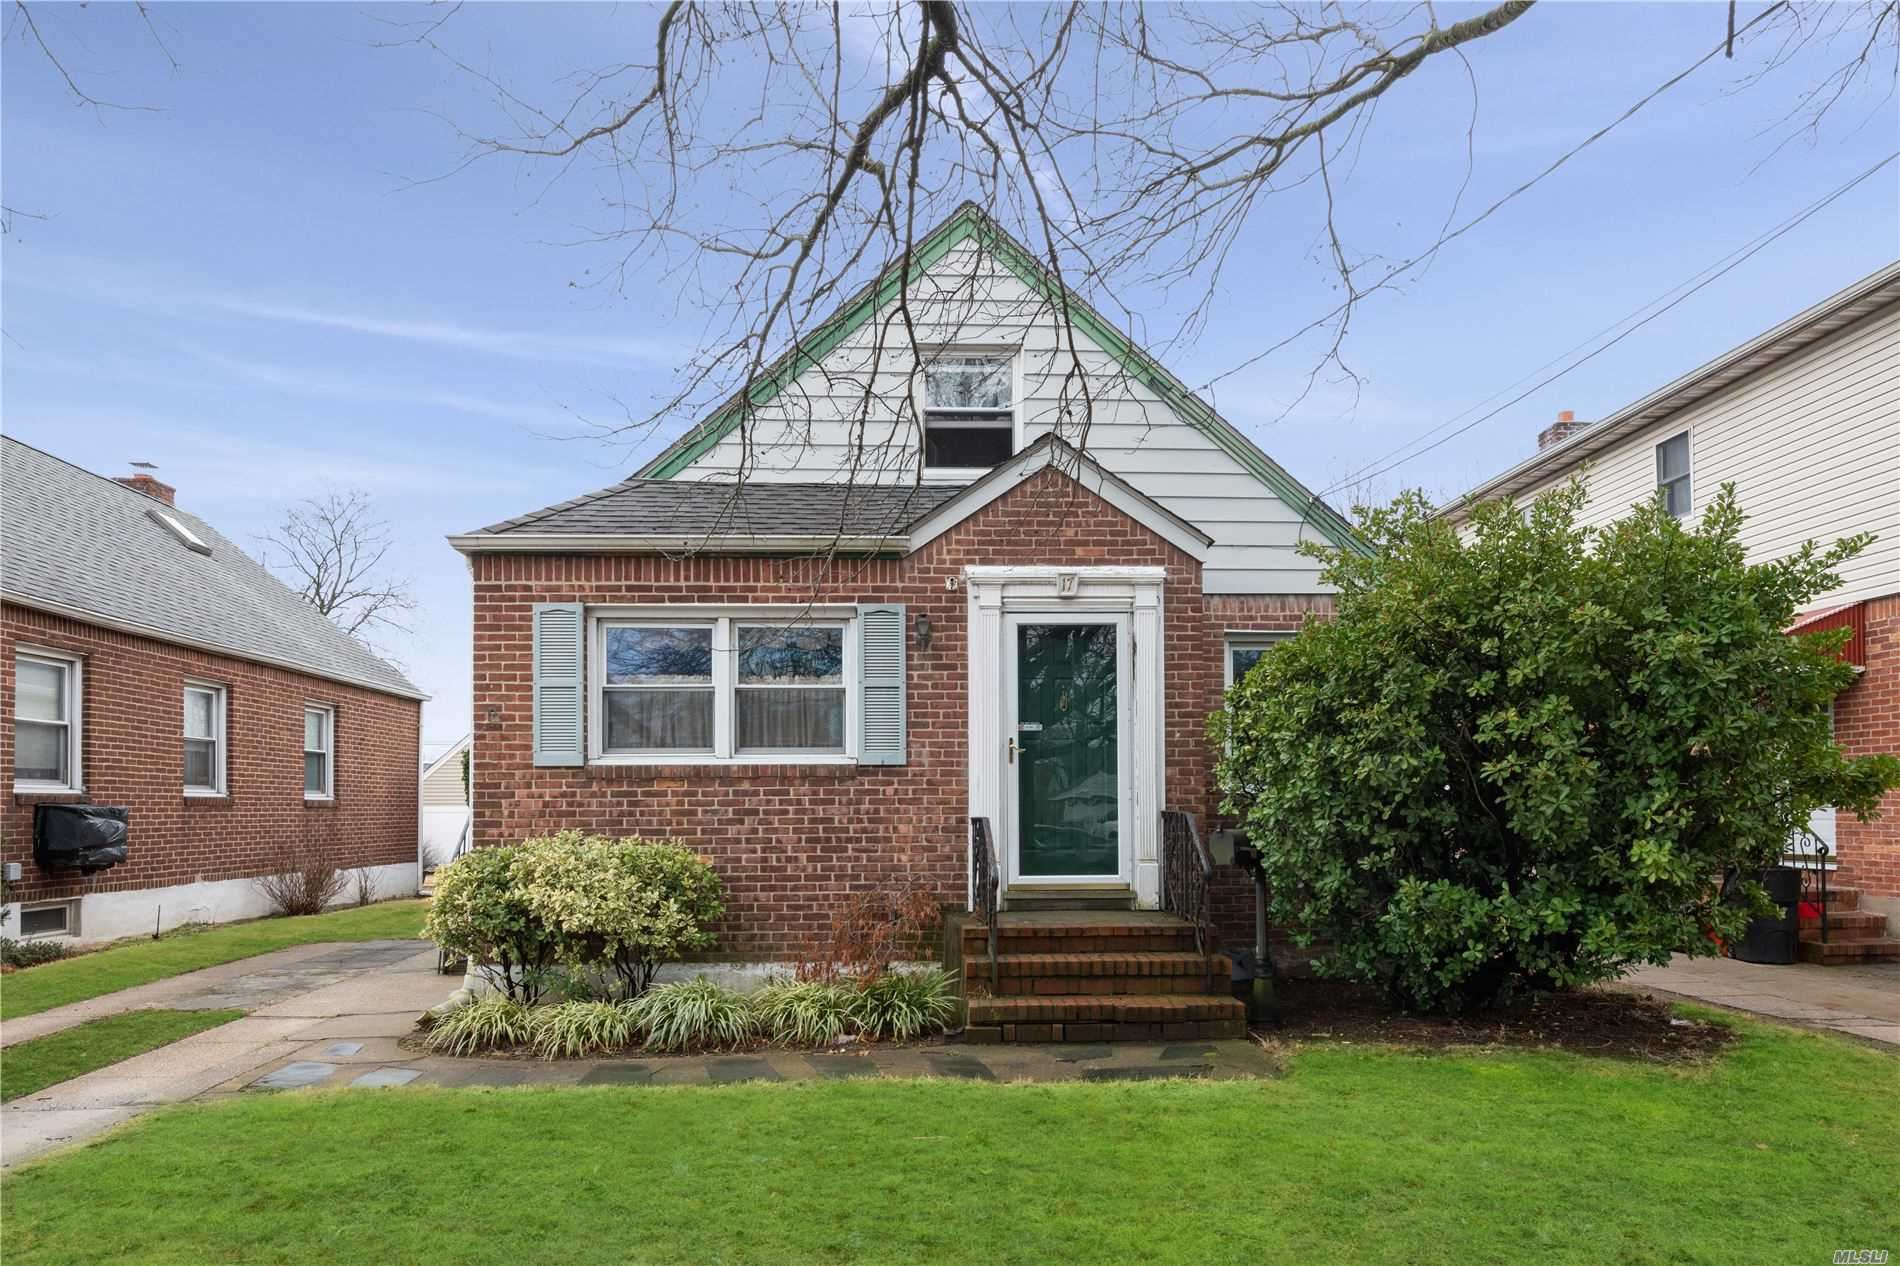 17 Peachgrove Drive, West Hempstead, NY 11552 - MLS#: 3203878